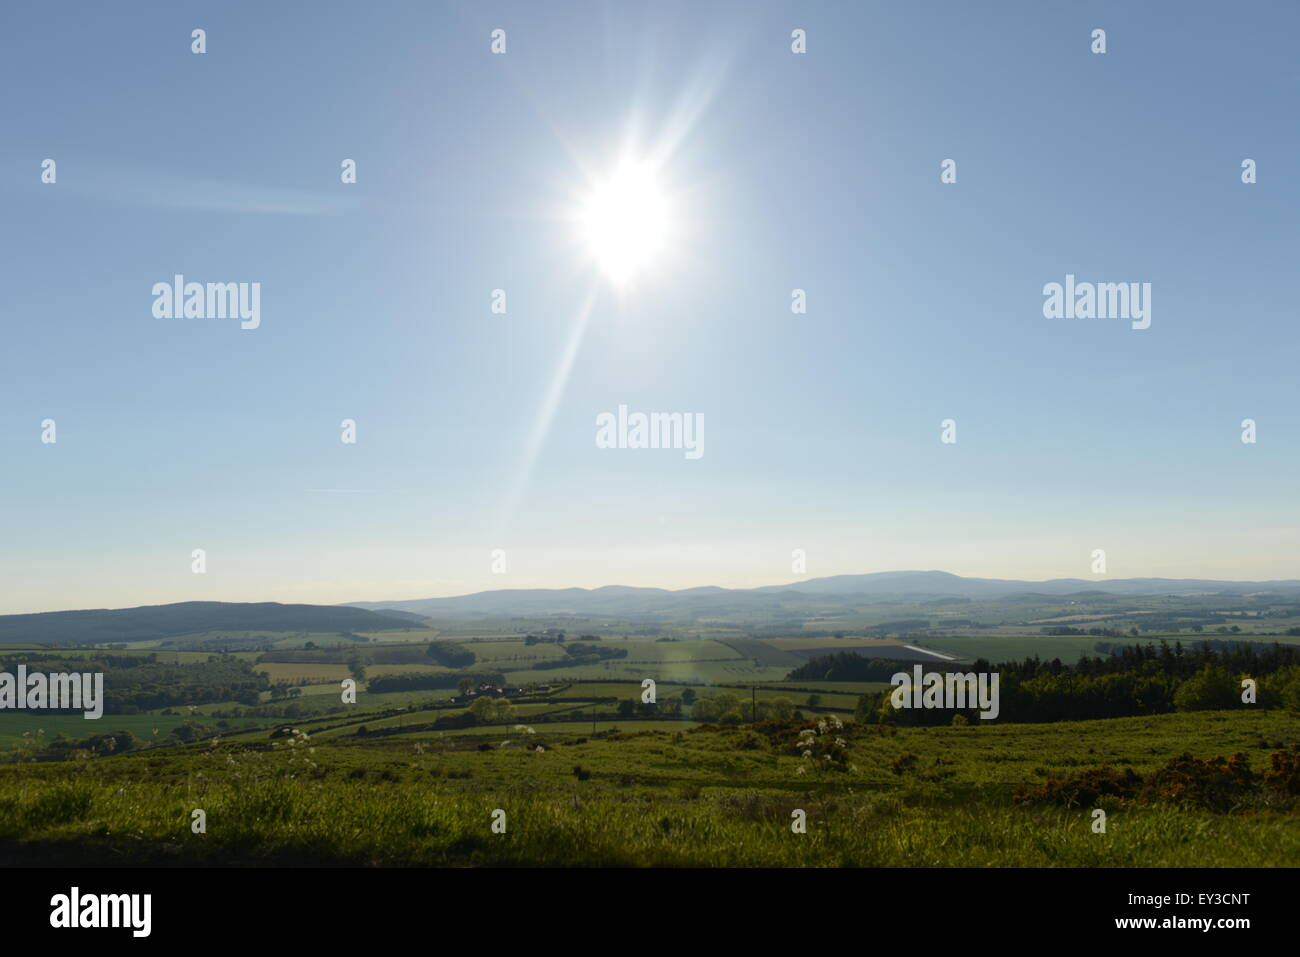 kielder, alnwick, drive, view border country - Stock Image